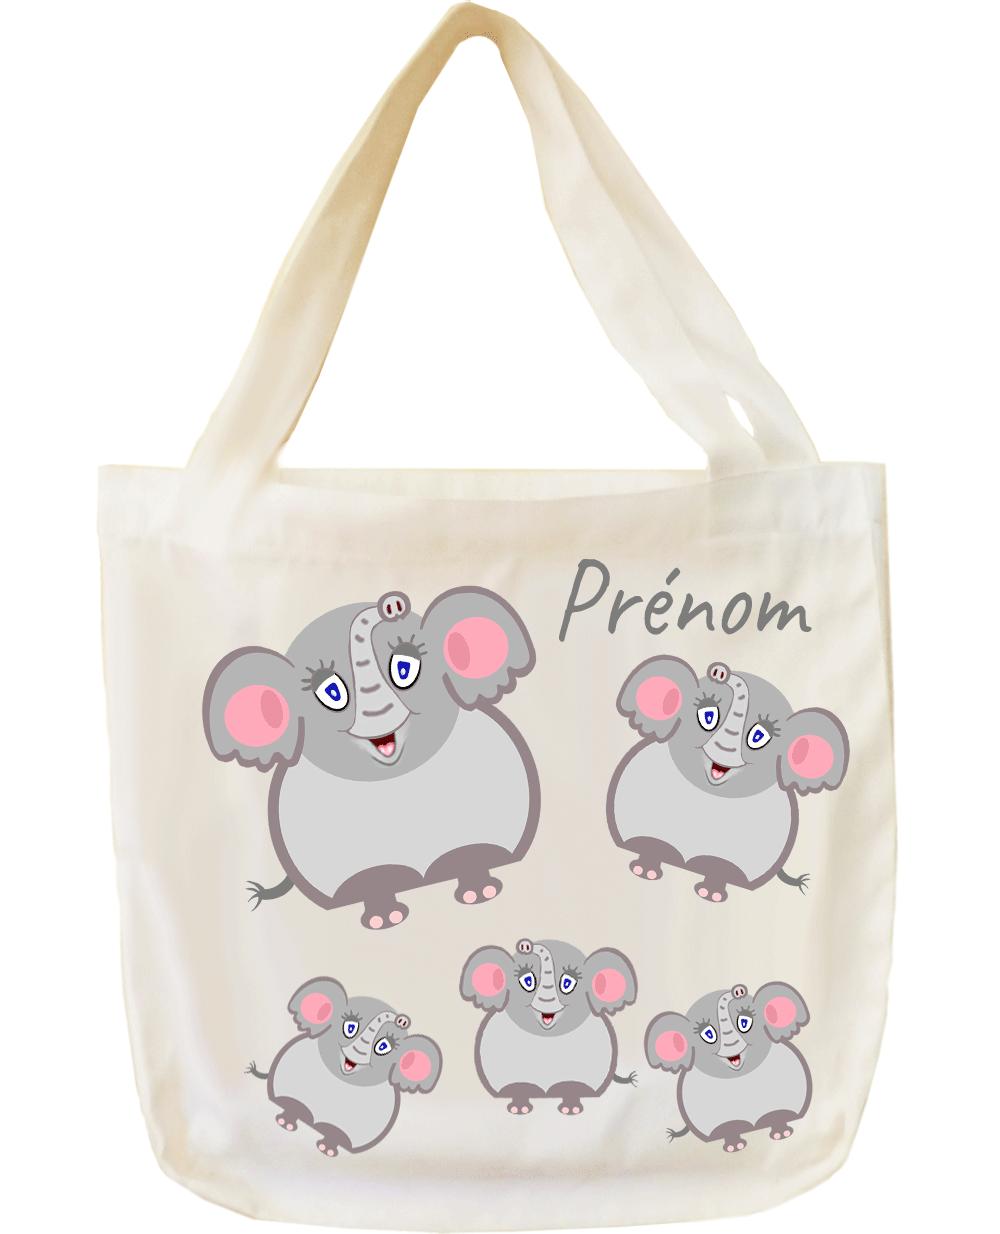 tote-bag;sac;cabas;texti;cadeaux;personnalisable;personnalisation;personnalise;prenom;animal;elephant